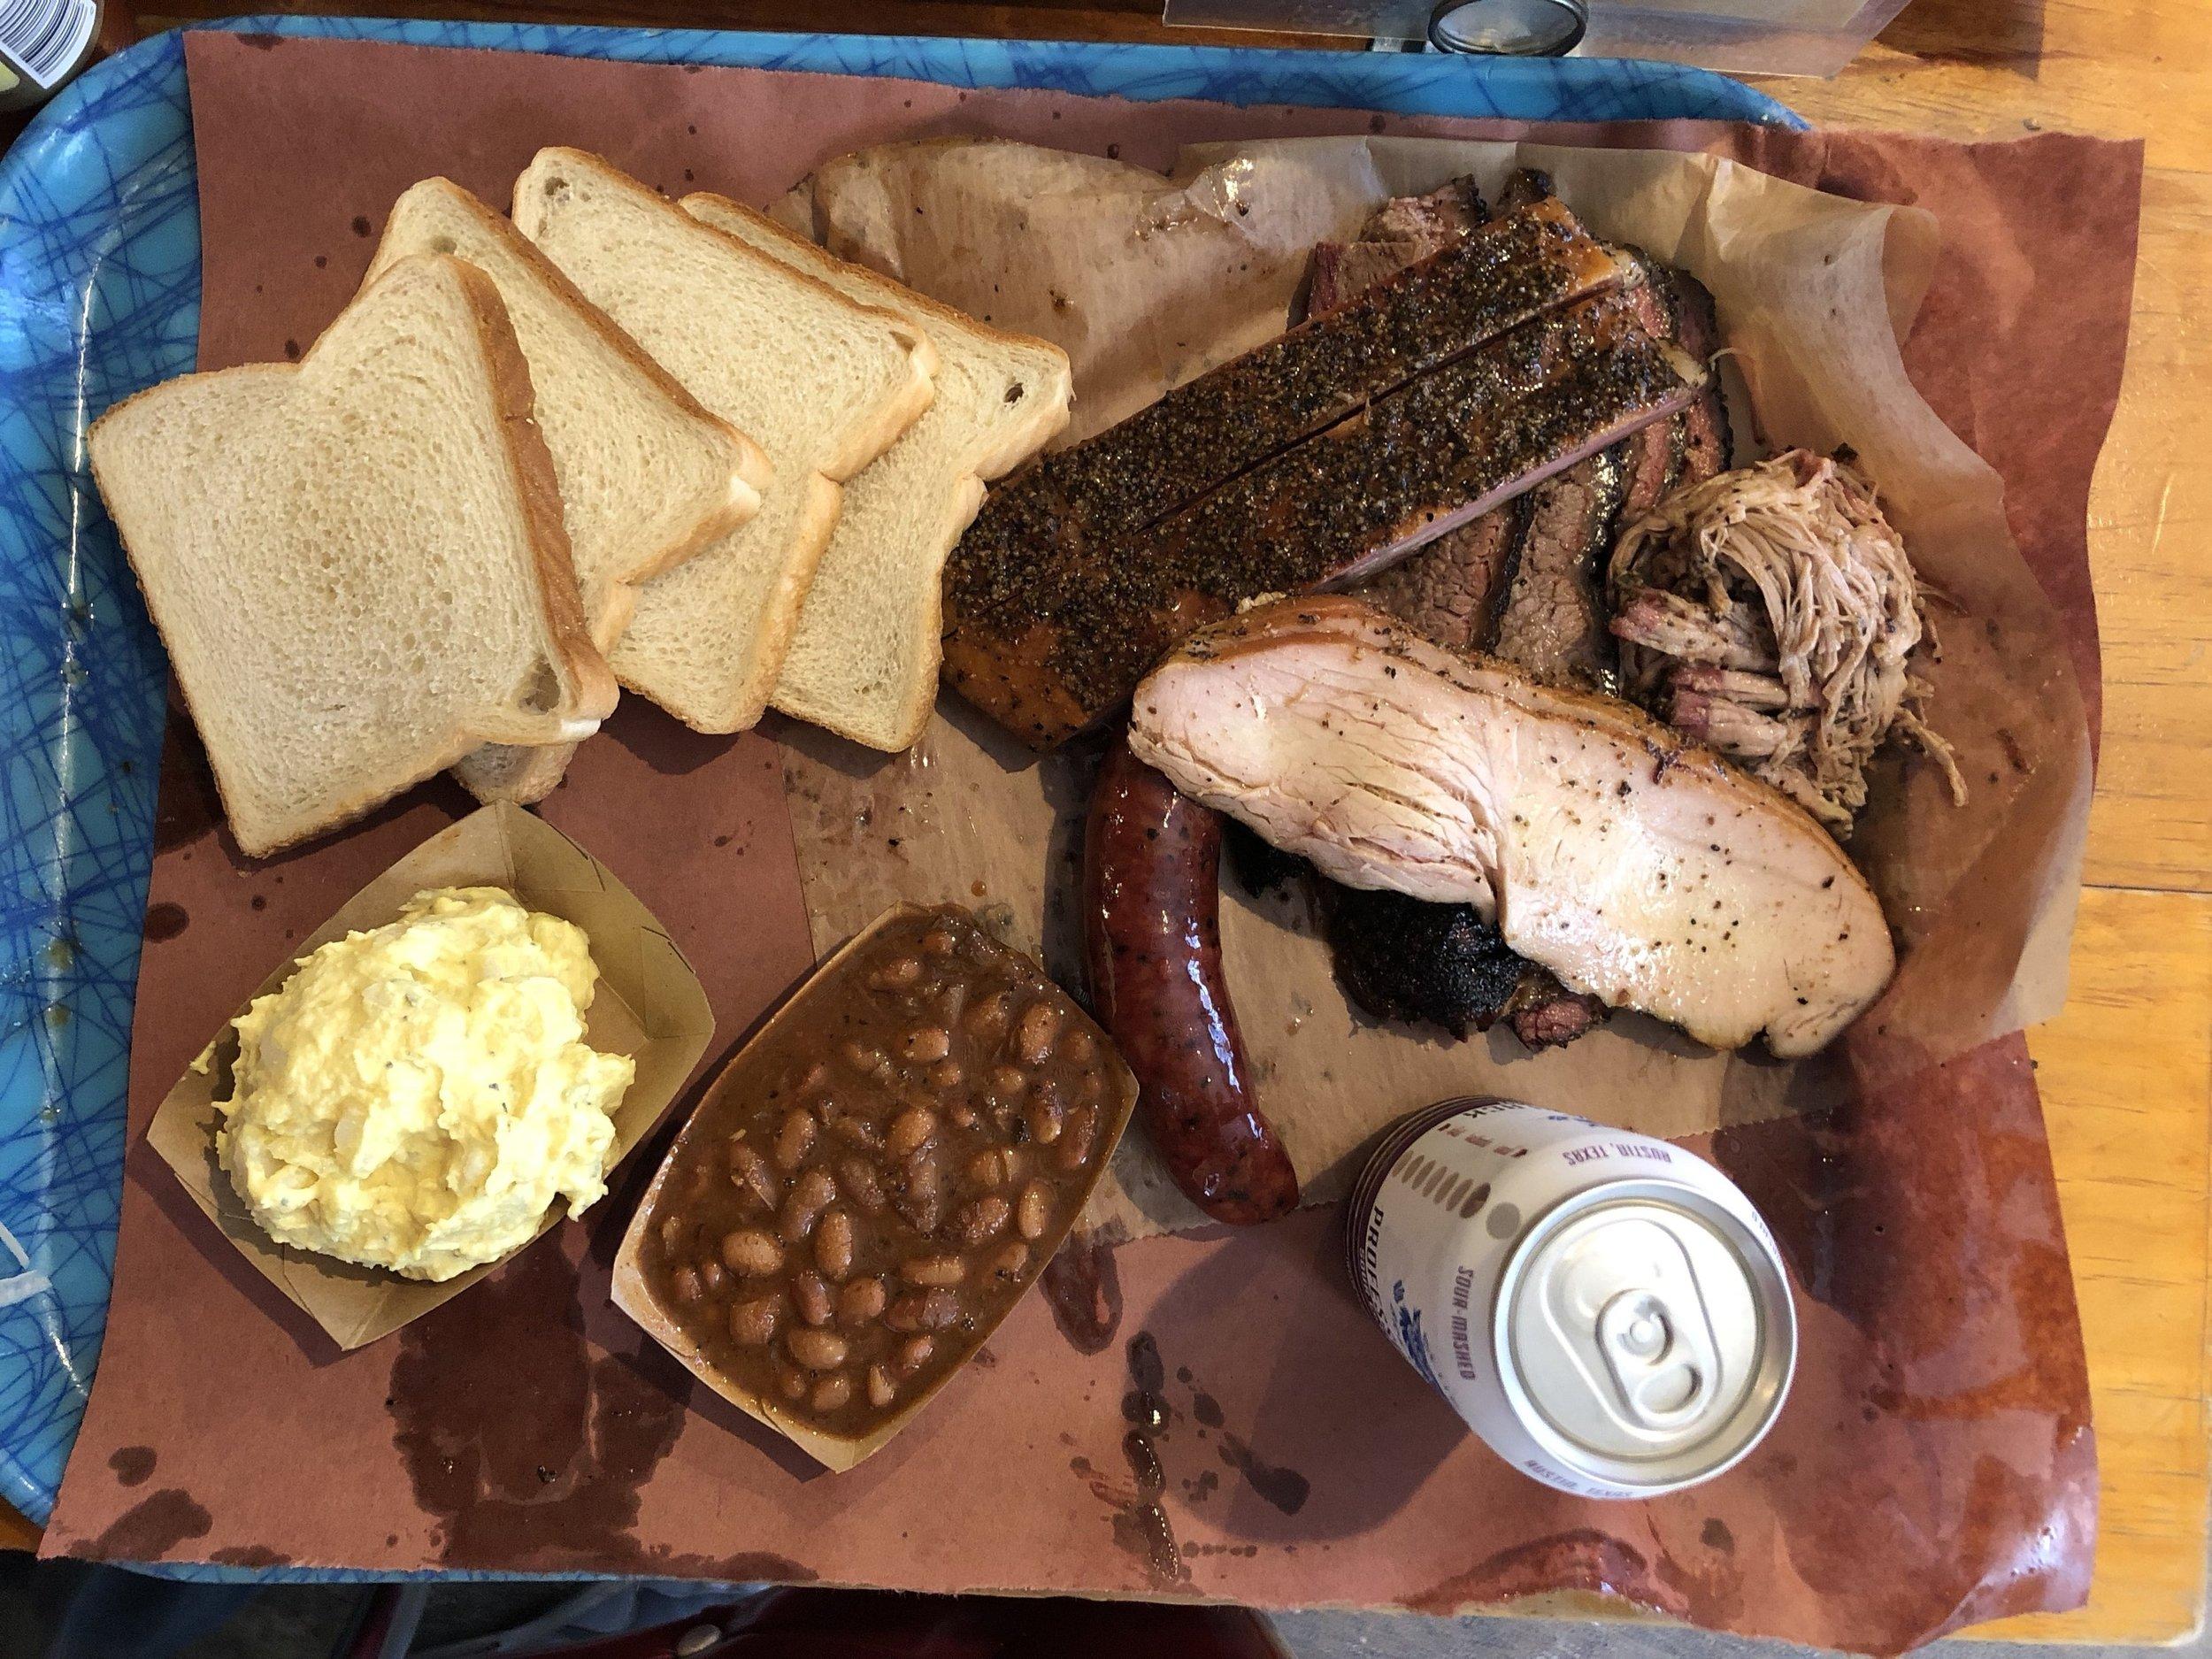 Spread at Franklin BBQ in Austin, TX